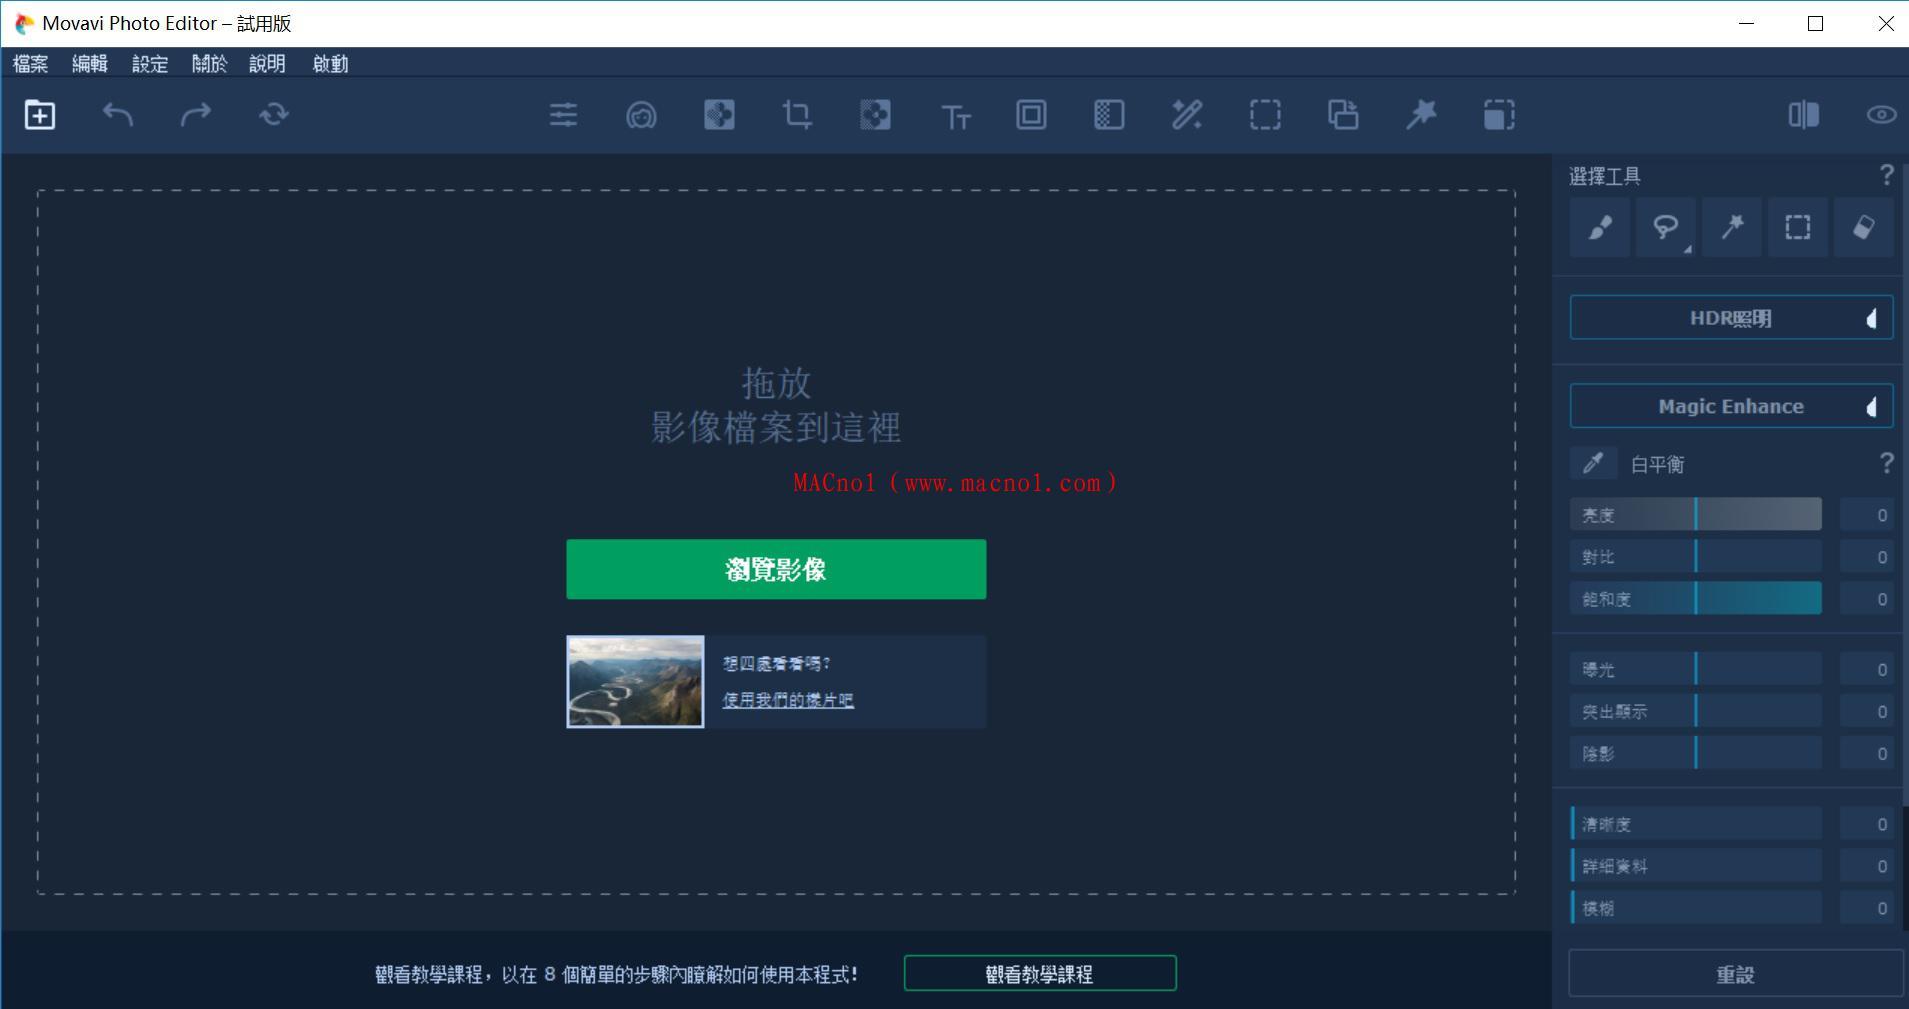 Movavi Photo Editor 破解版(照片编辑软件)v6.6.0 中文破解版